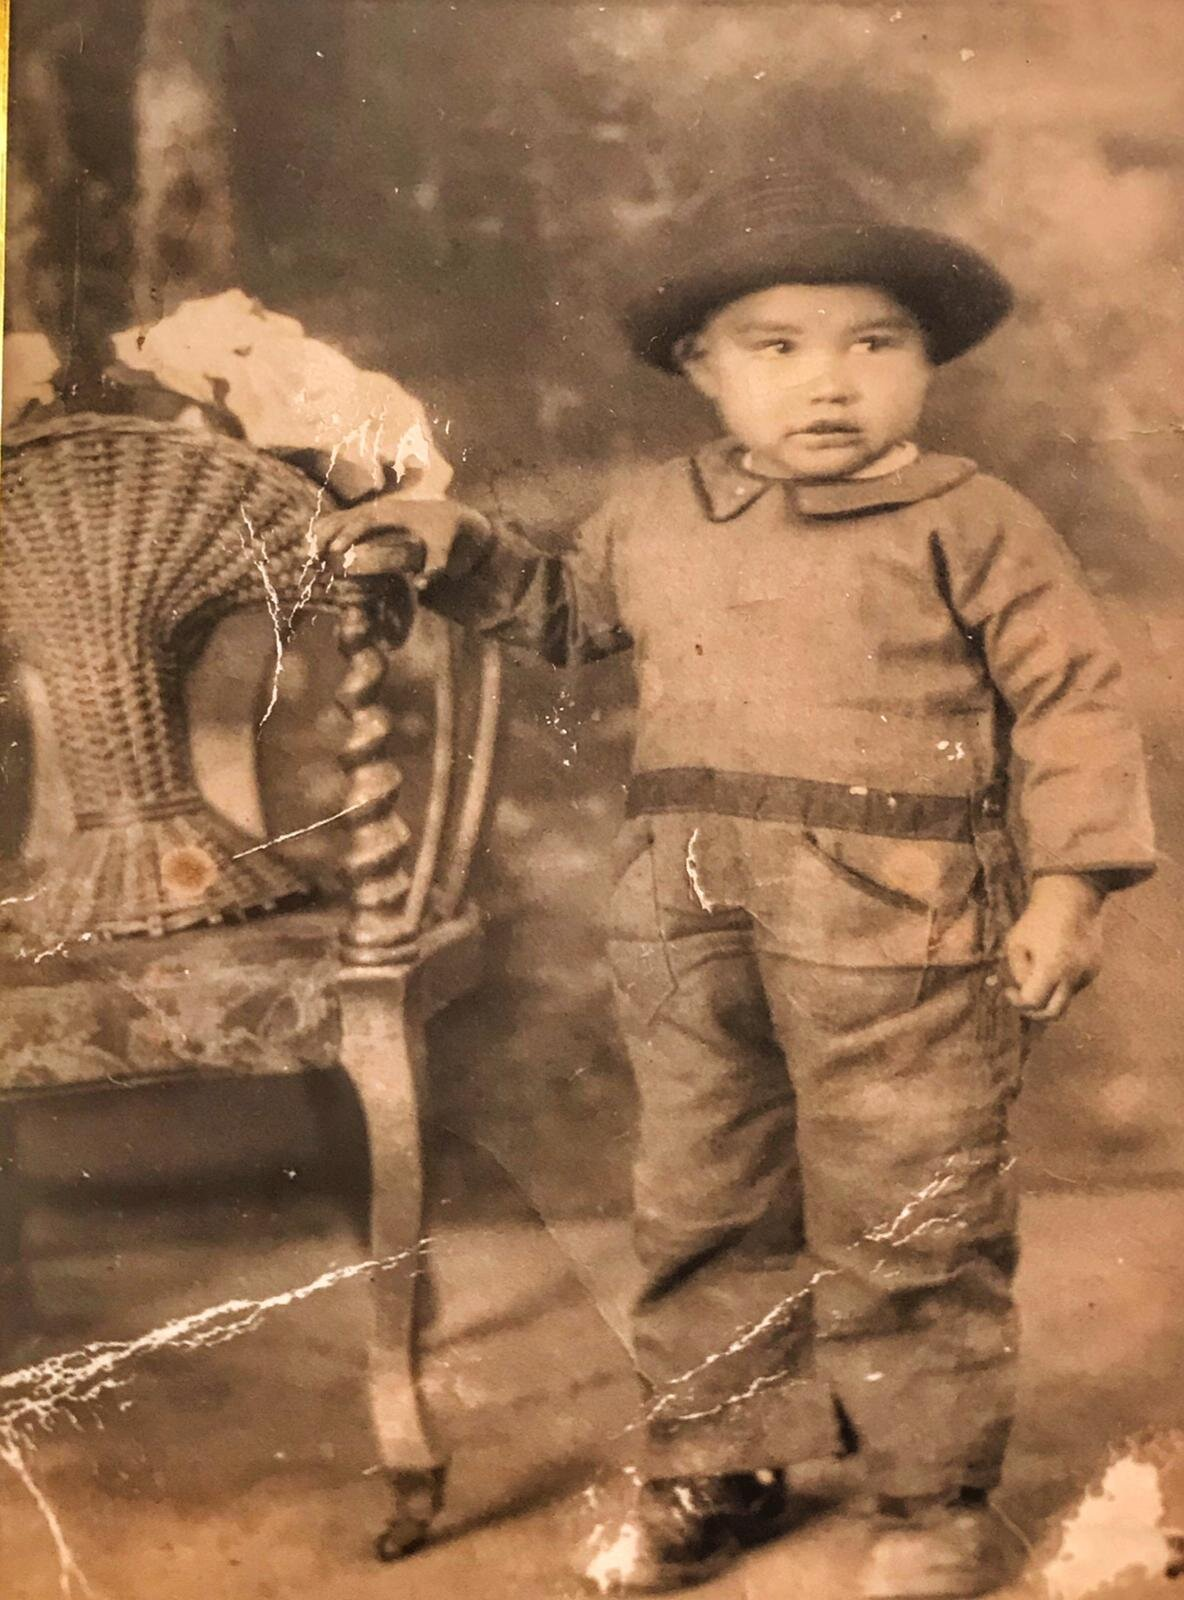 Young Epifanio V. Barajas ca. 1923-1924